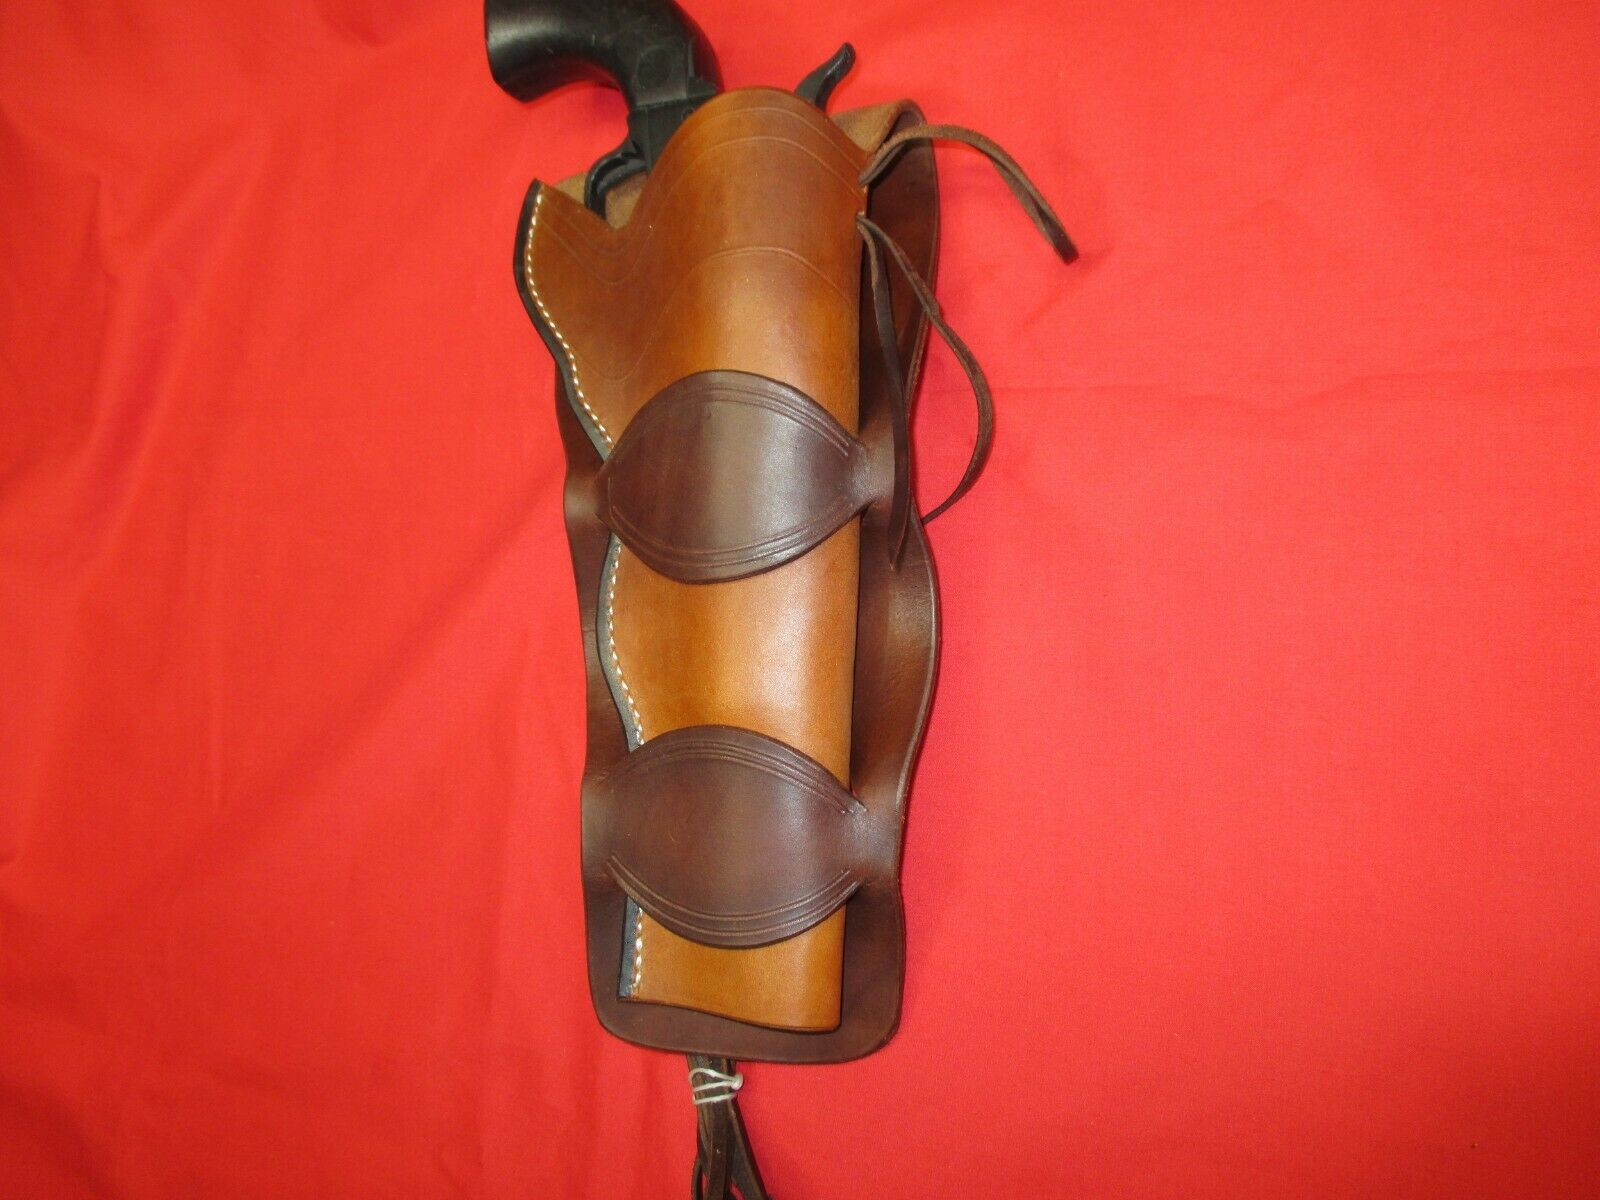 Western Doble Lazo 45 S.A. Funda, línea fina Tooling teñido 2 Tone 7.5  barril